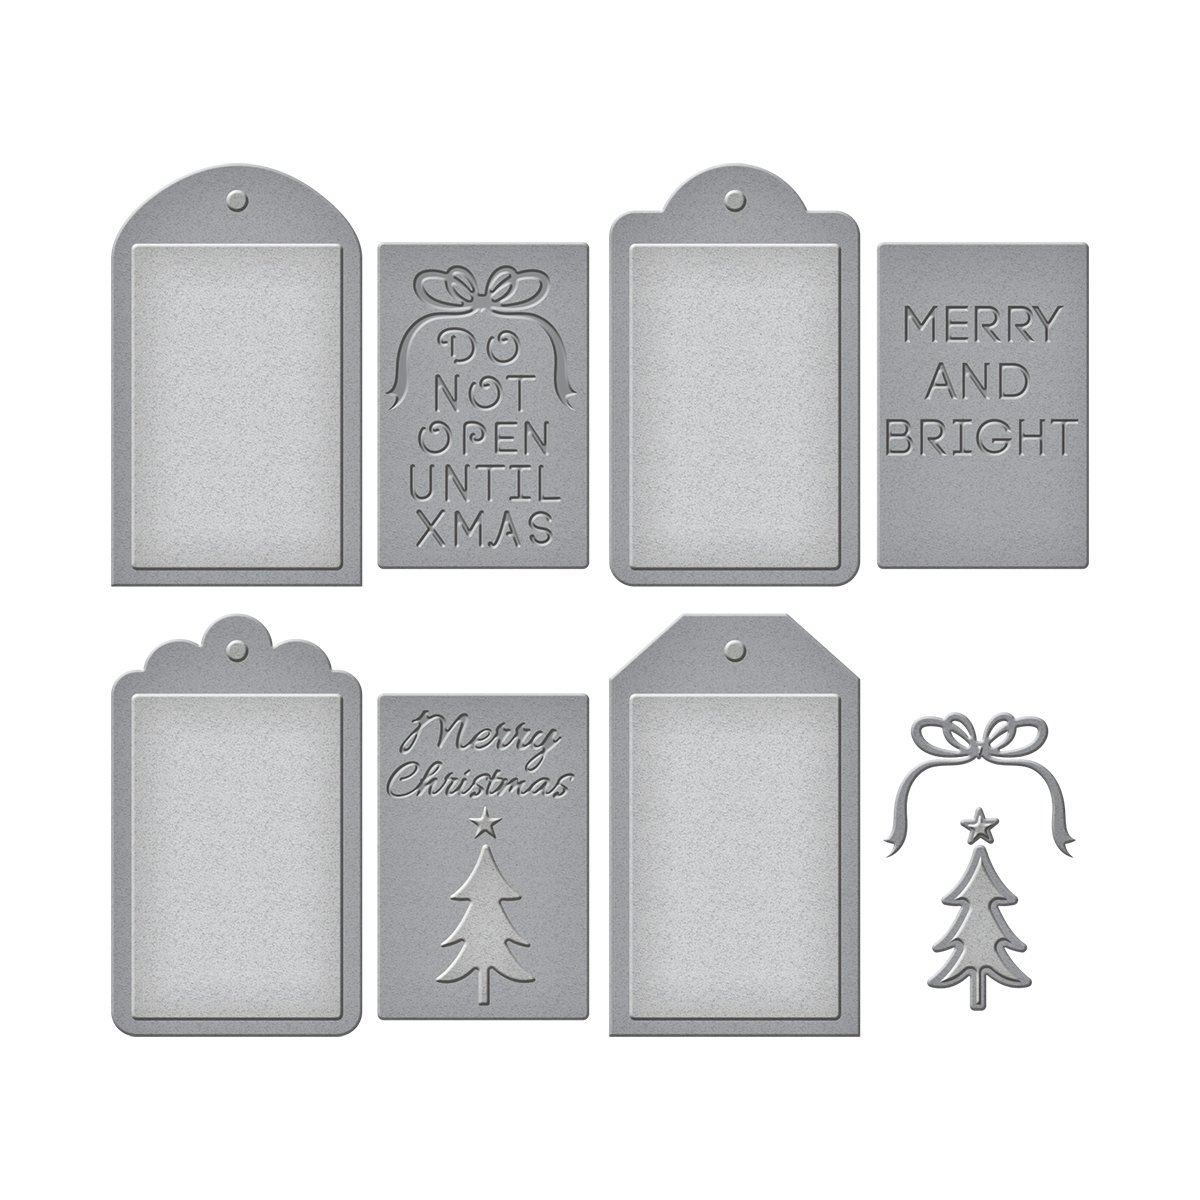 Spellbinders Shapeabilities Die Set con Natale, in metallo, colore: marrone S5-265